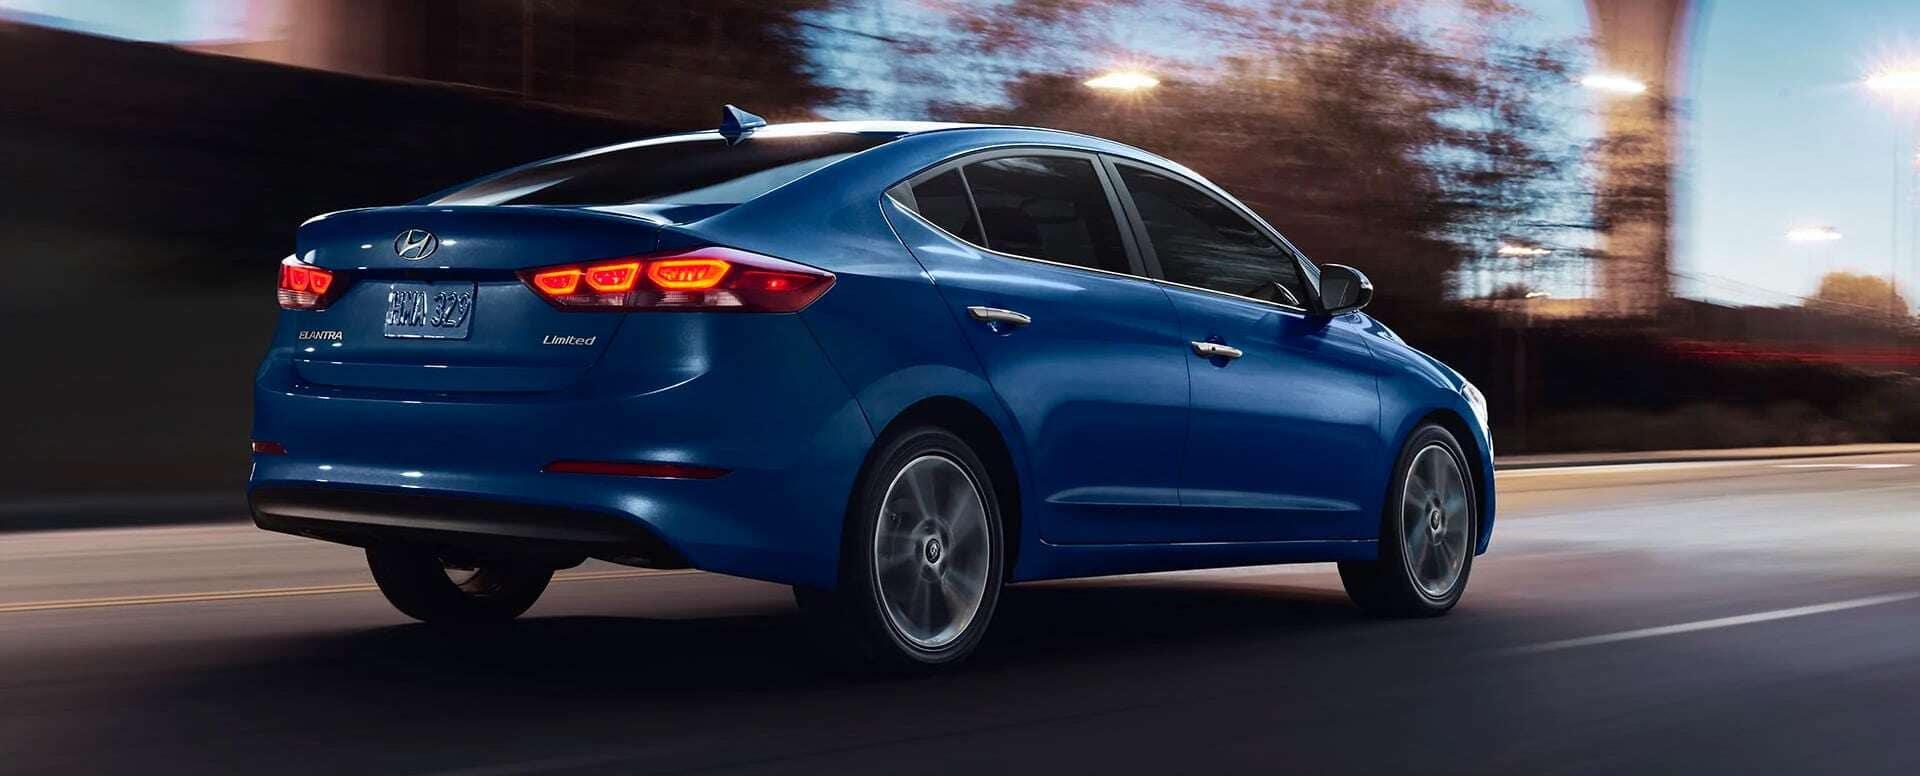 2018 Hyundai Elantra Interior Chicago IL